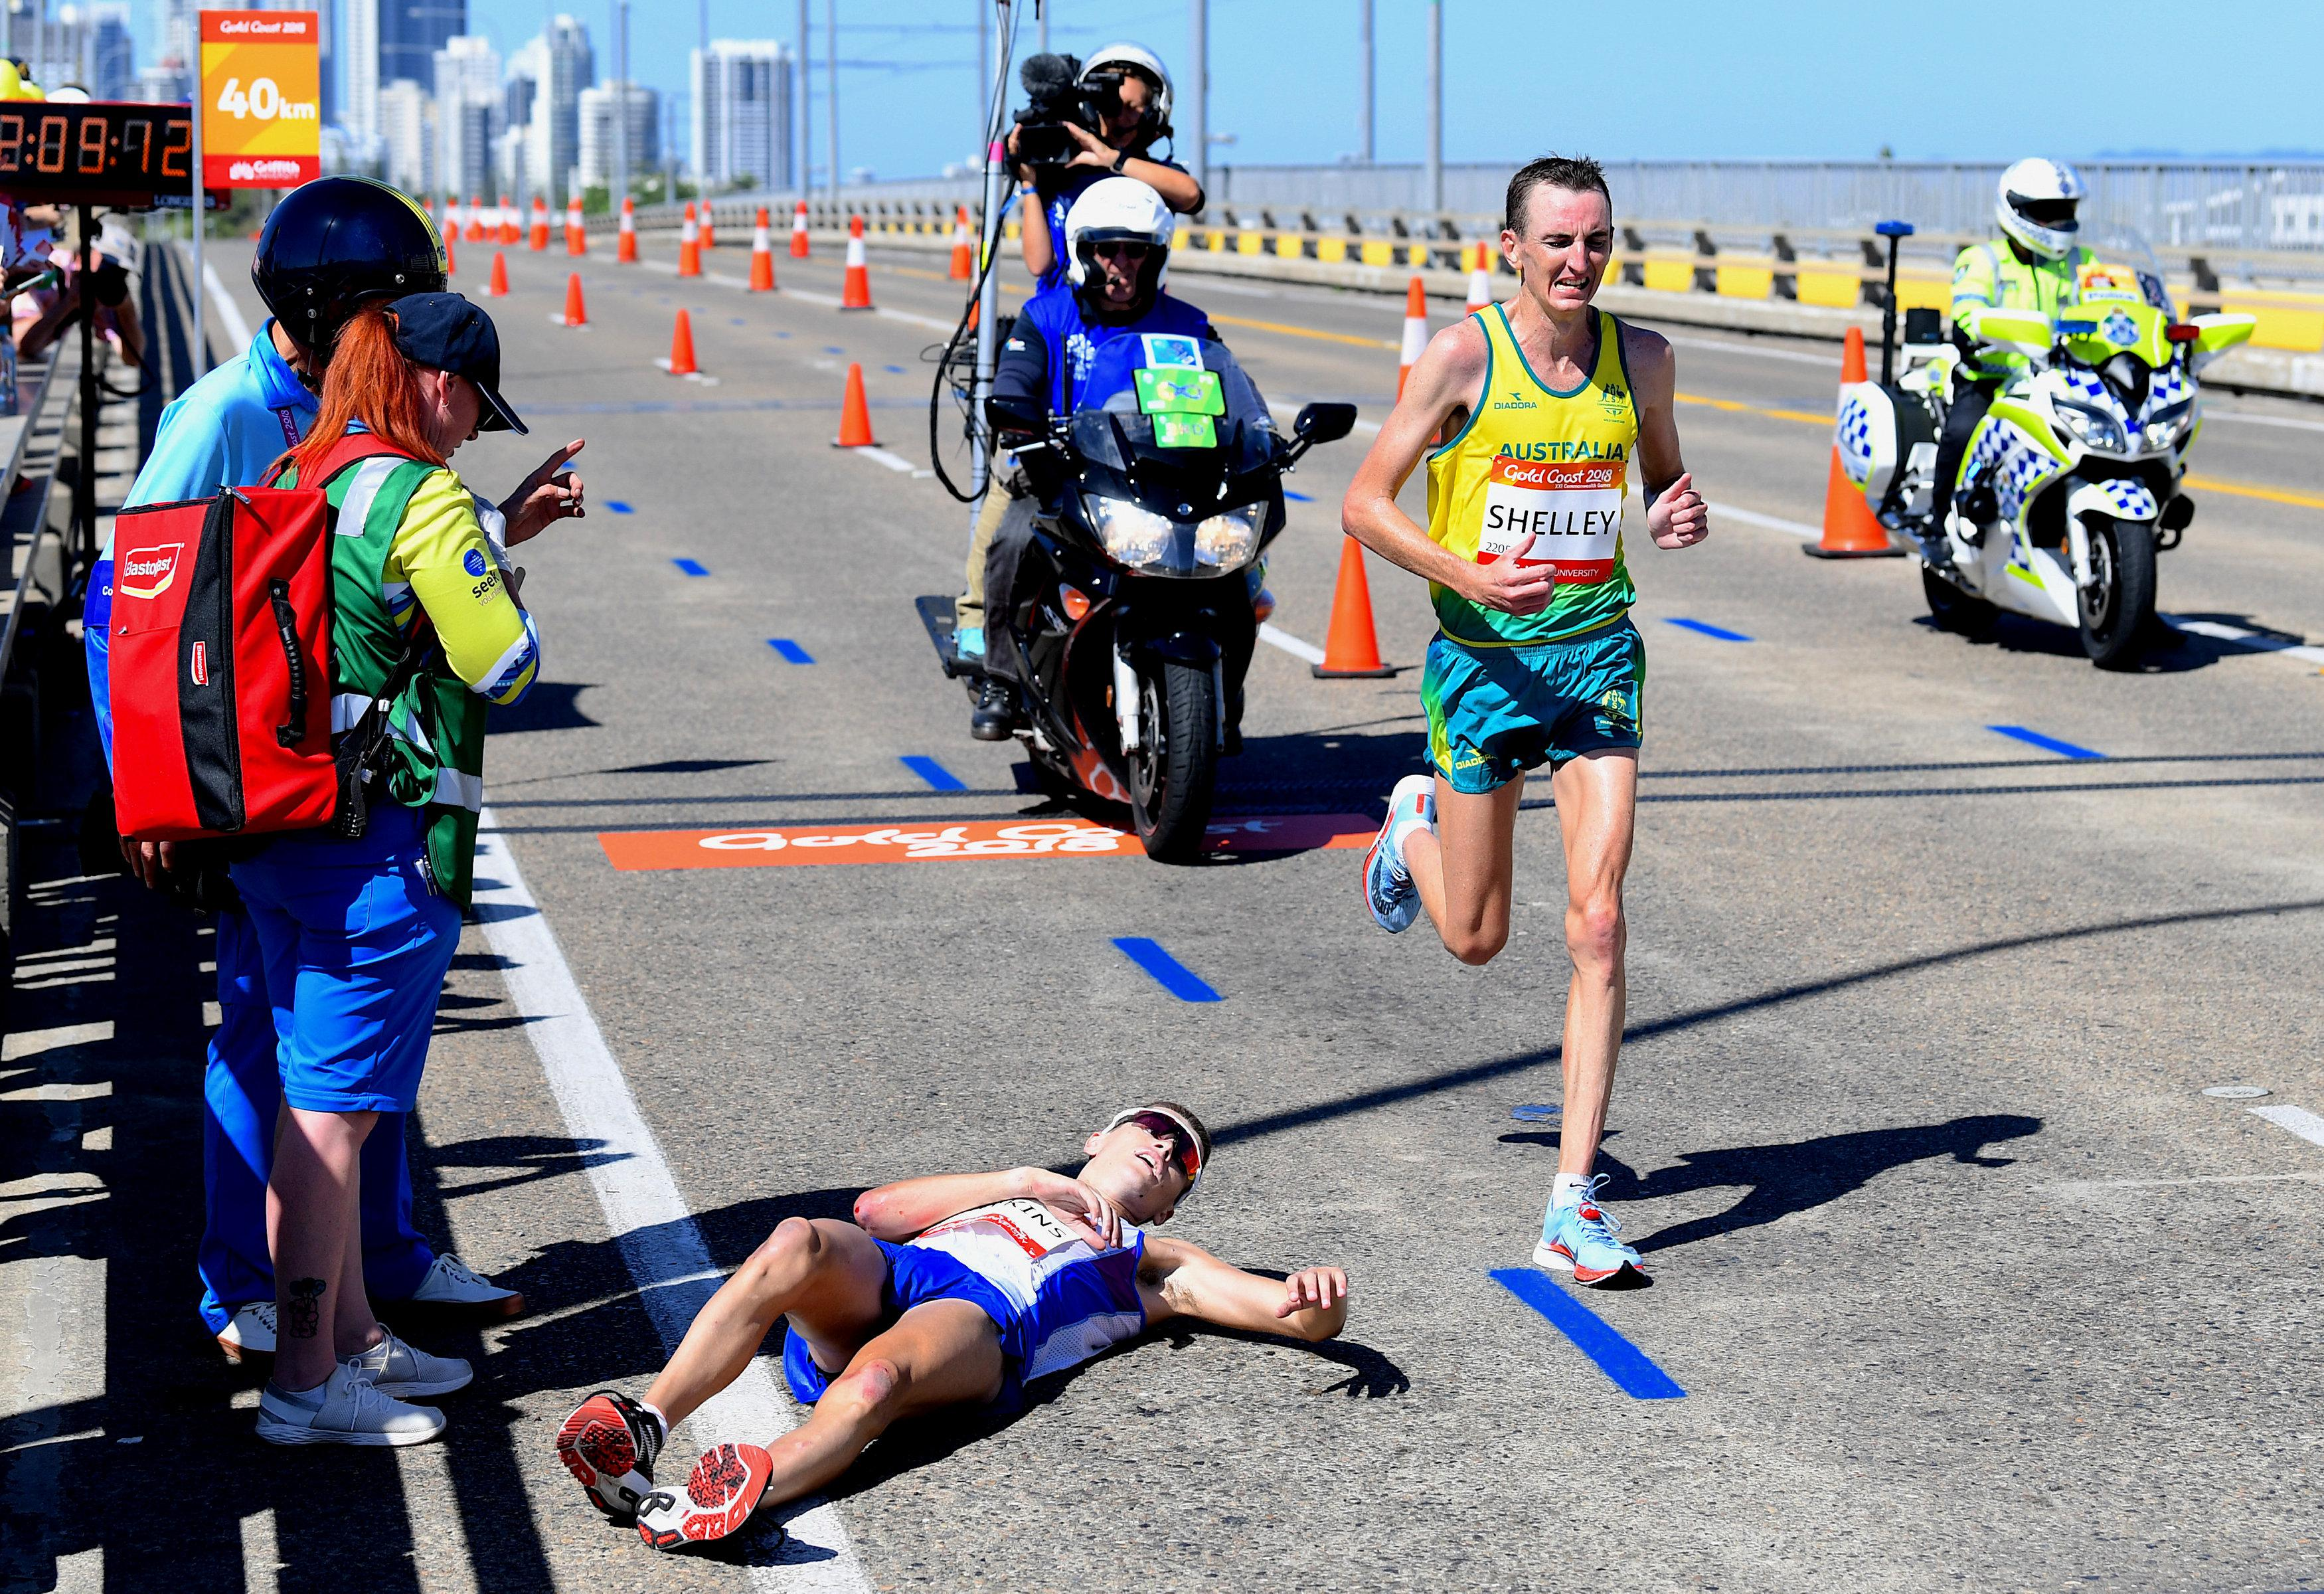 Australian athlete Michael Shelley runs past fallen Callum Hawkins